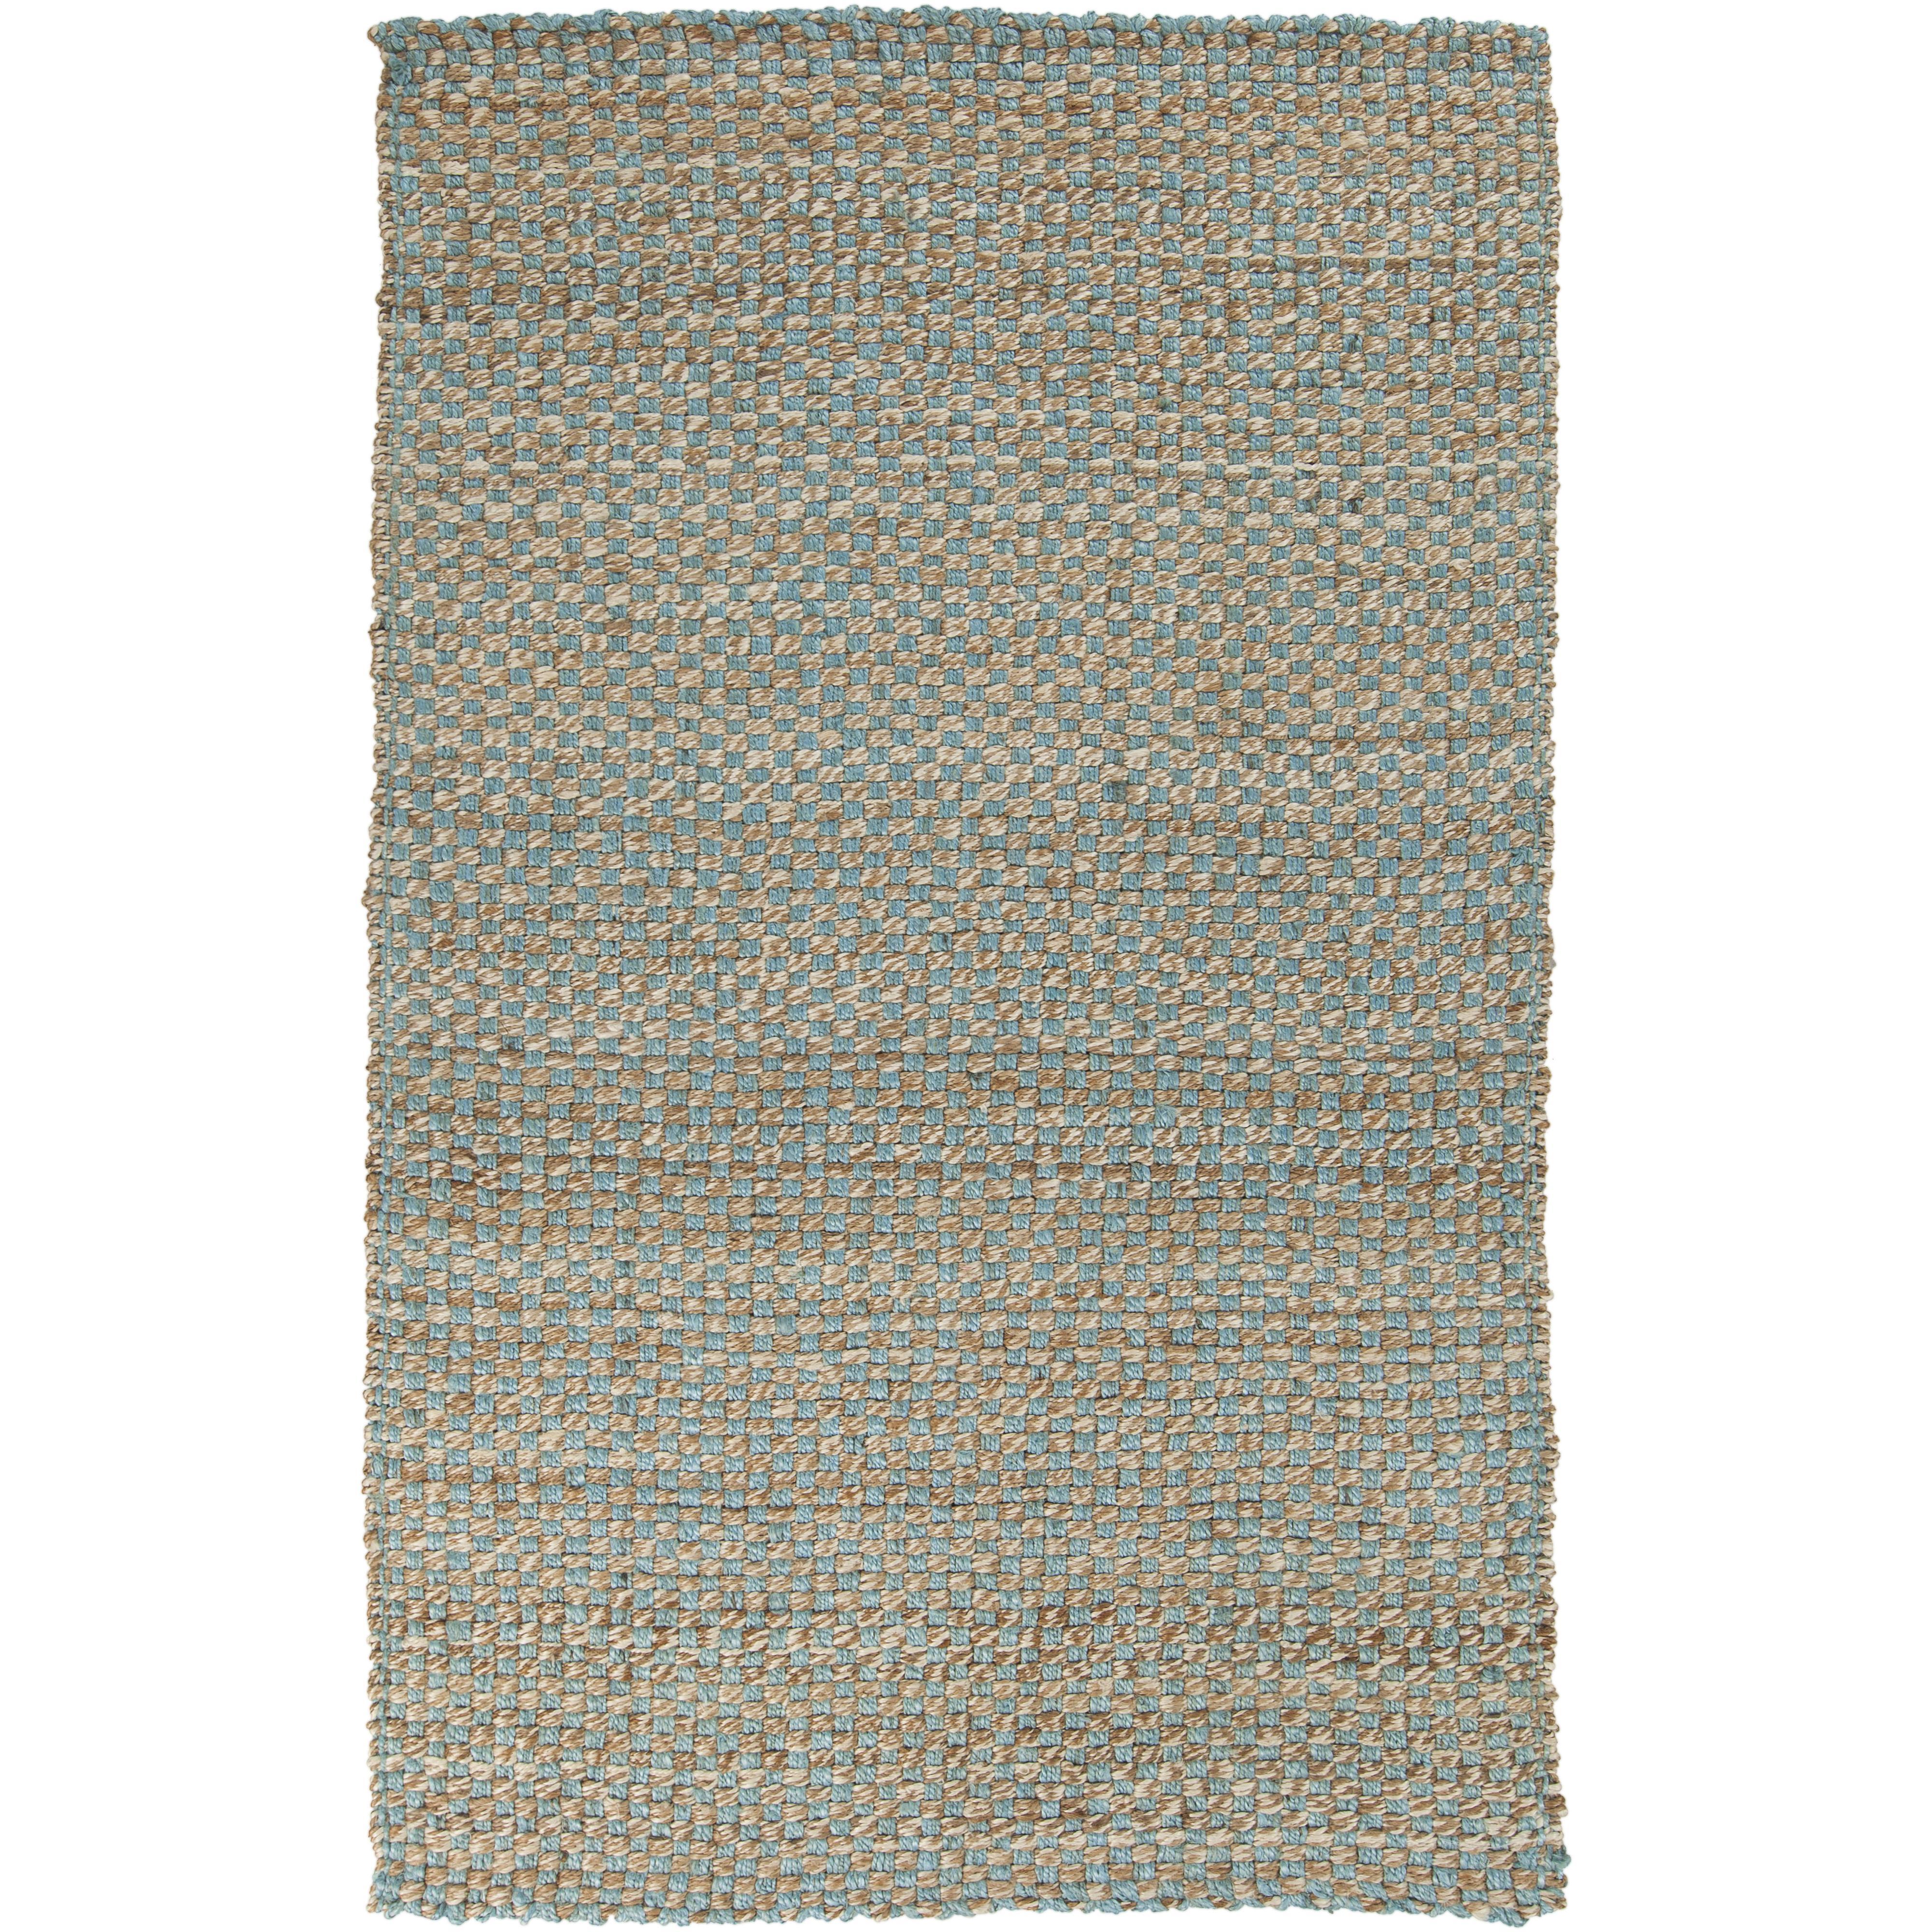 Surya Reeds 5' x 8' - Item Number: REED823-58